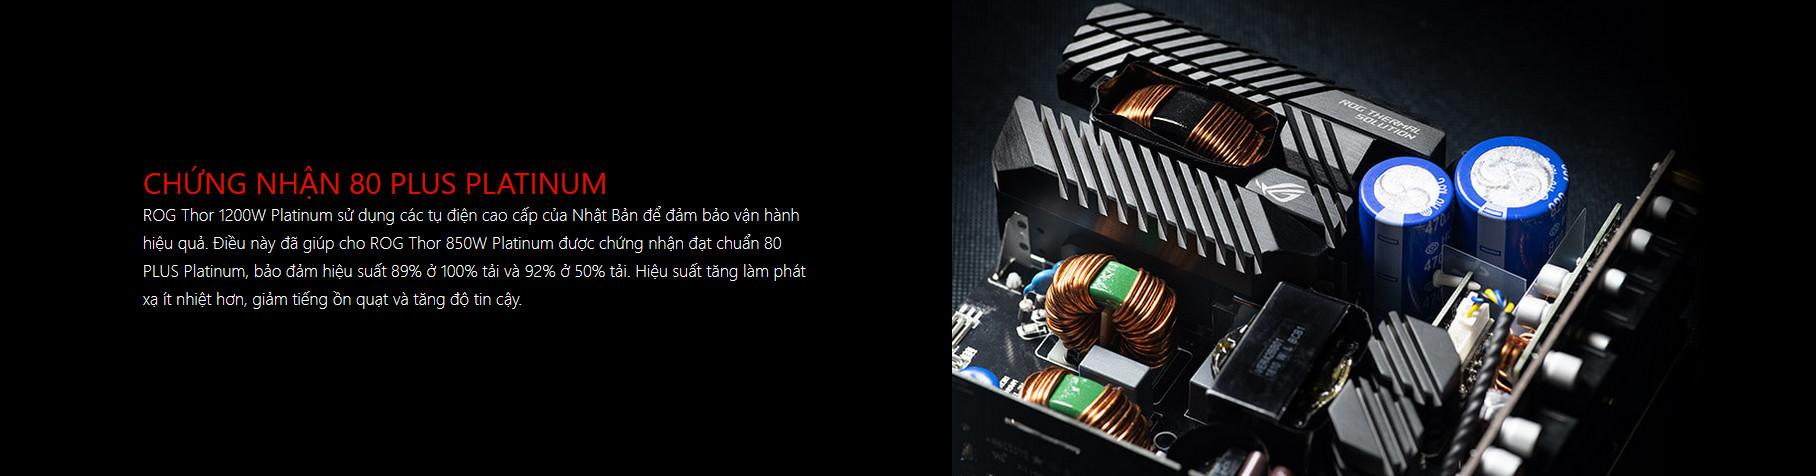 Nguồn Asus ROG Thor 1200W Platinum - RGB 1200W 80 Plus Platinum Full Modular chuẩn 80 plus